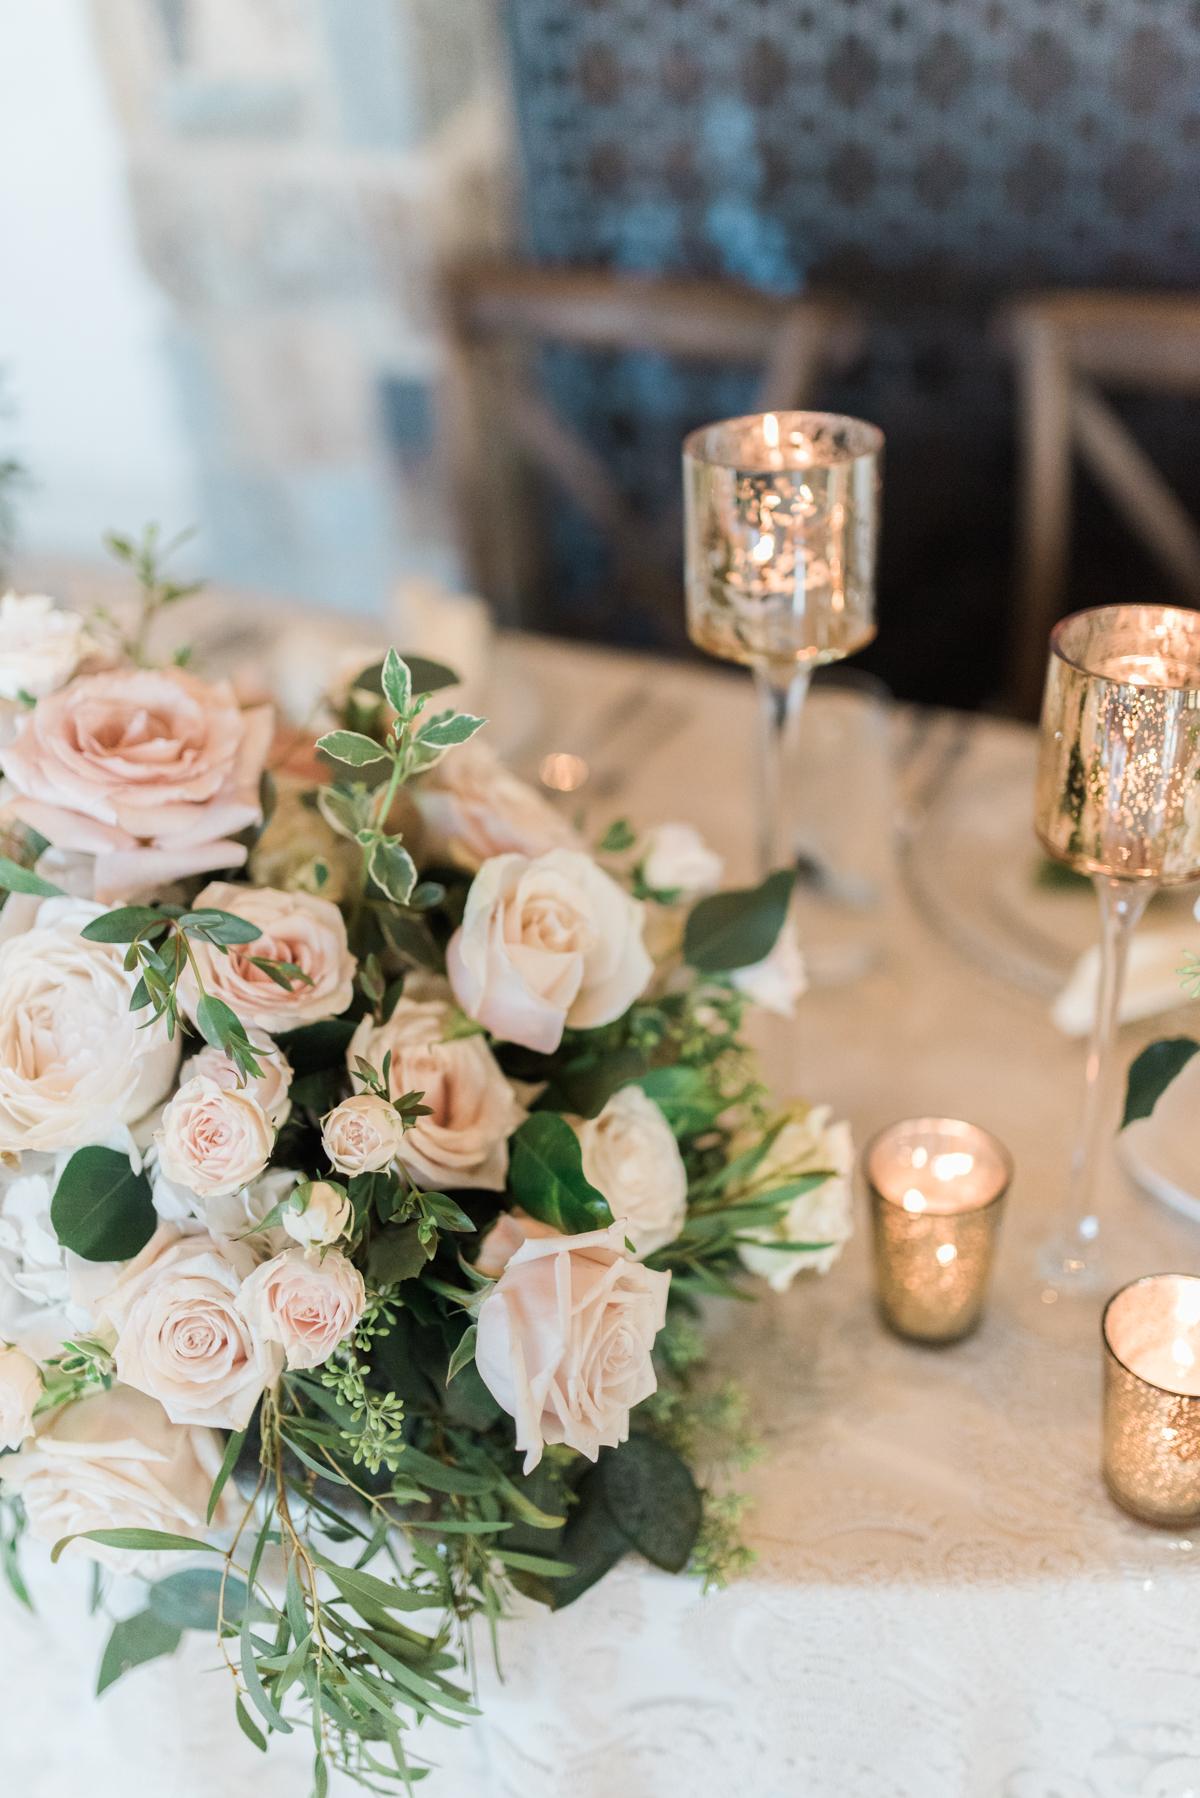 Blog Roxy Farbod Rolling Hills Country Club Wedding Sneaks _ Hello Blue Photo-88